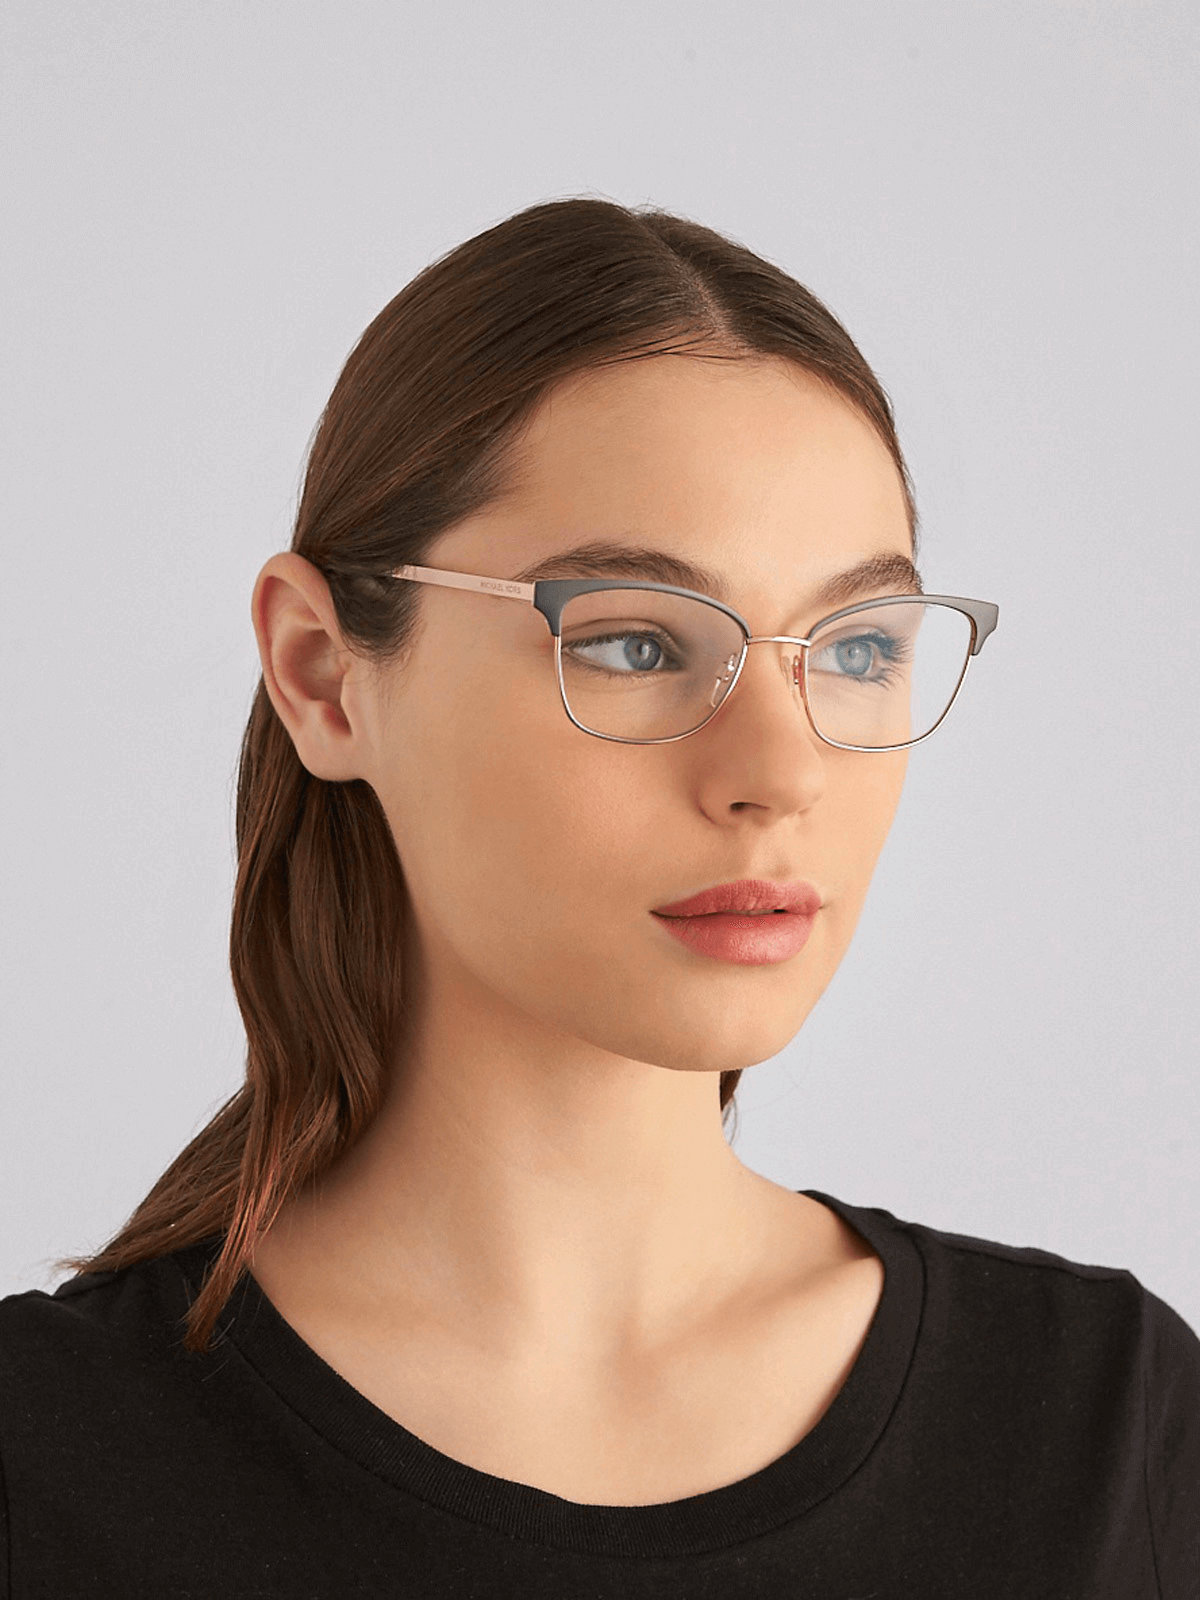 b3f83f9e5202 Michael Kors ADRIANNA IV | Glasses.com® | Free Shipping